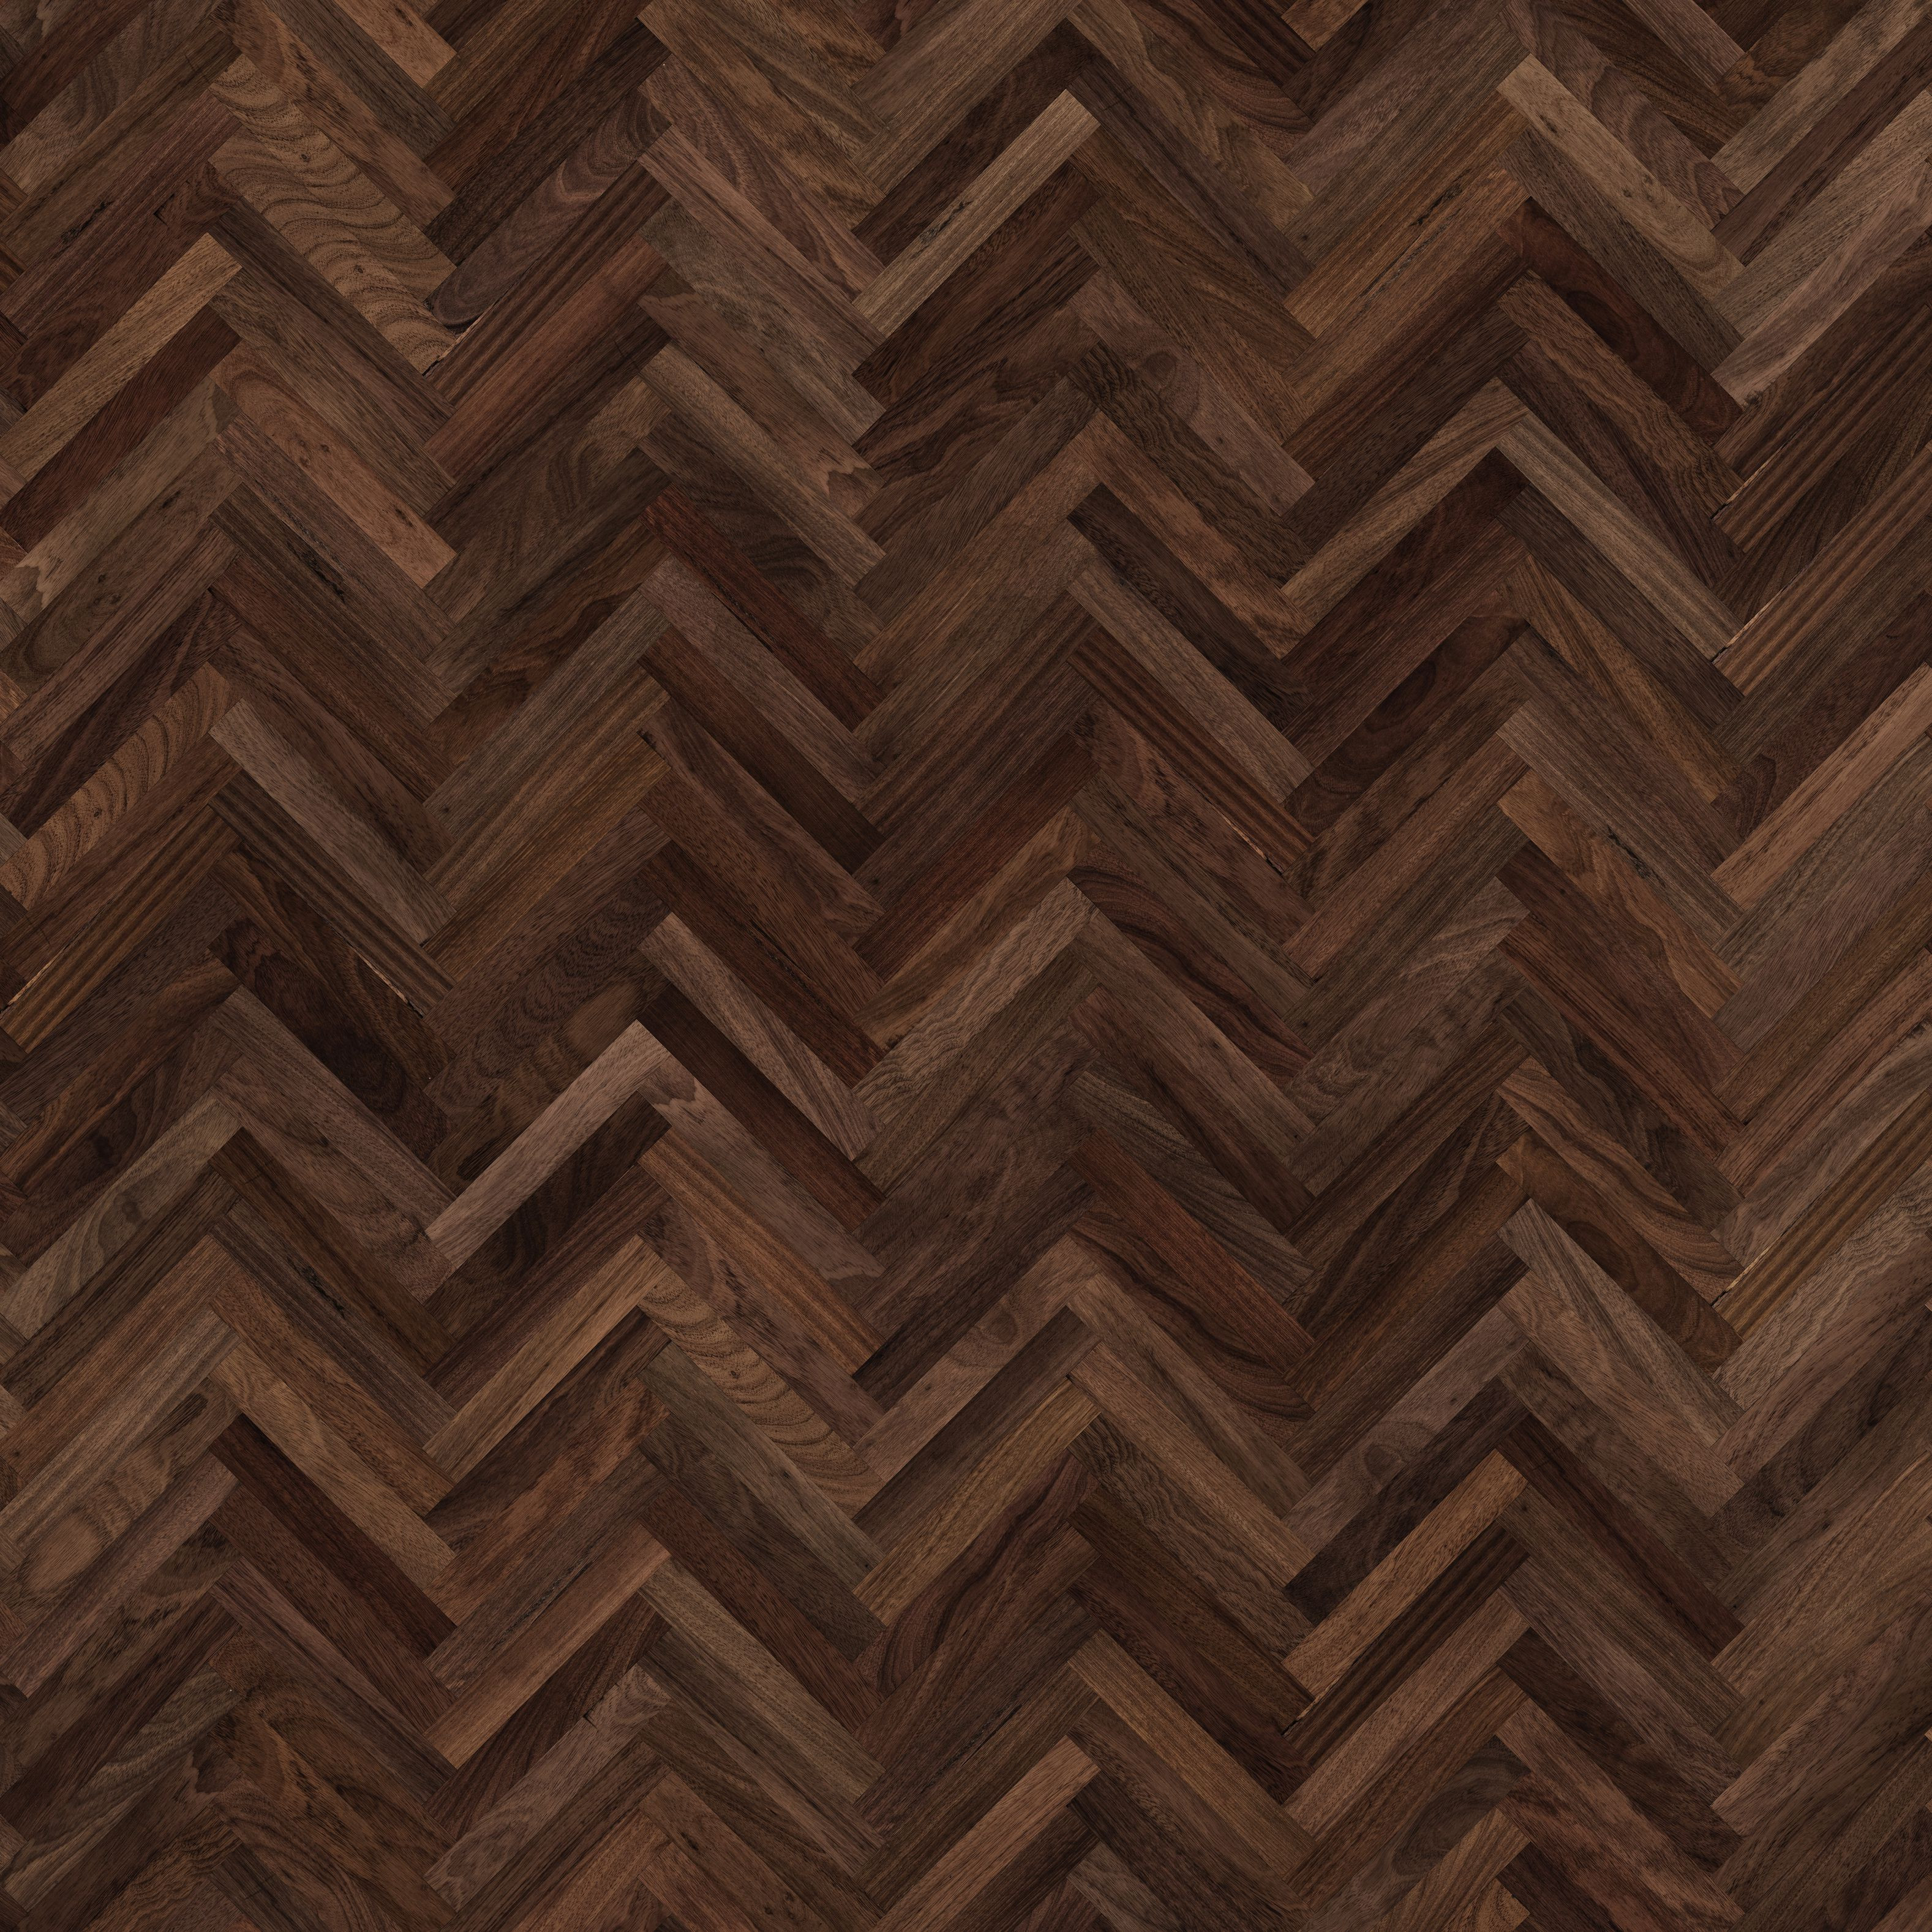 walnut hardwood flooring pros and cons of parquet wood flooring regarding dark brown wood background xxxl 171110782 587c06b75f9b584db316fb21